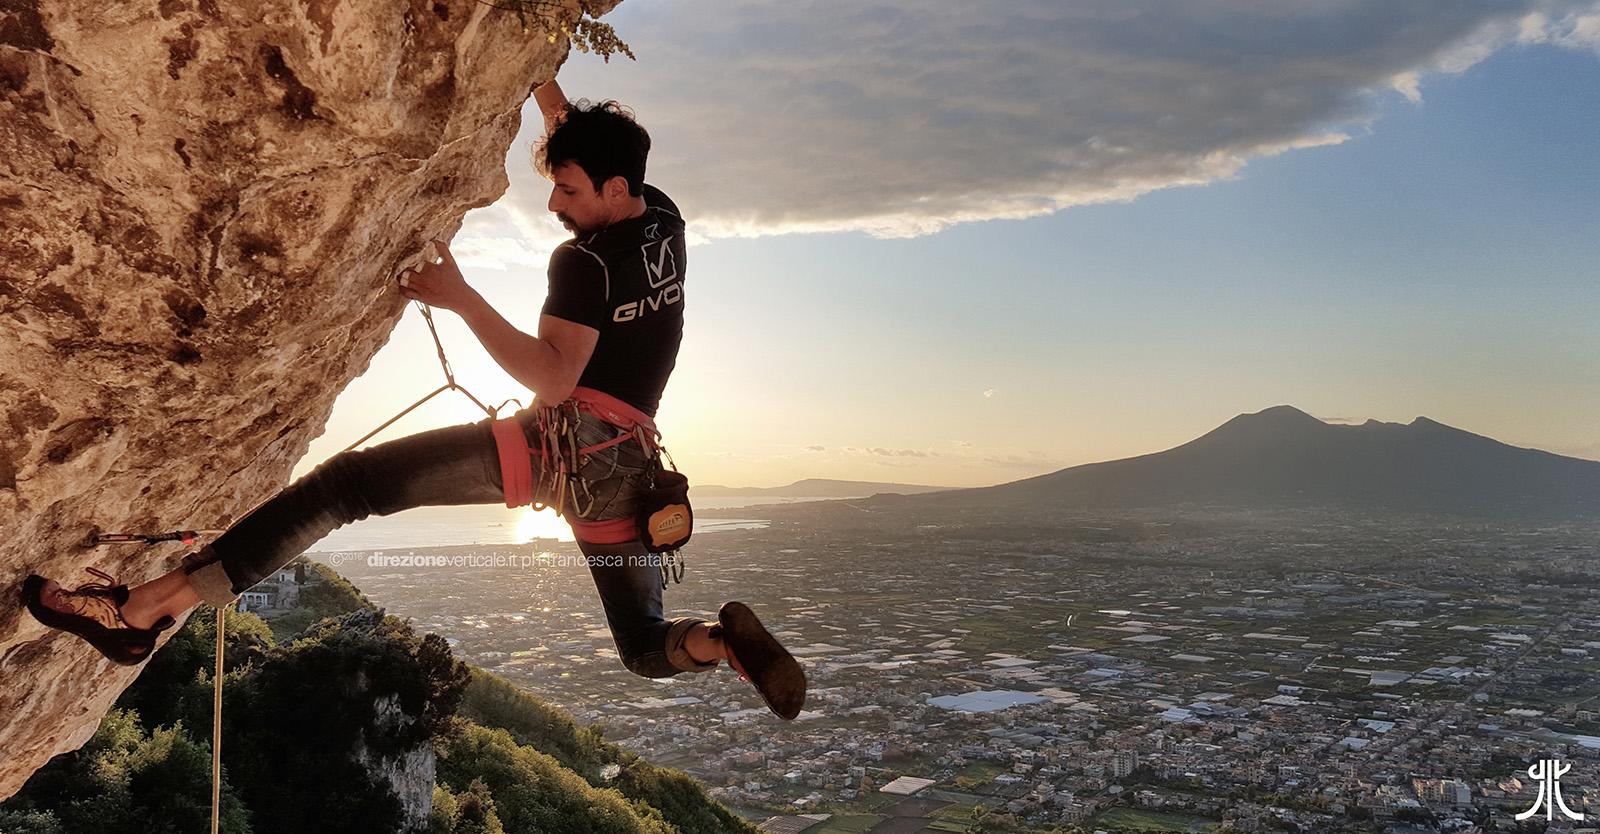 Lettere Crag Climbing Vesuvius Naples